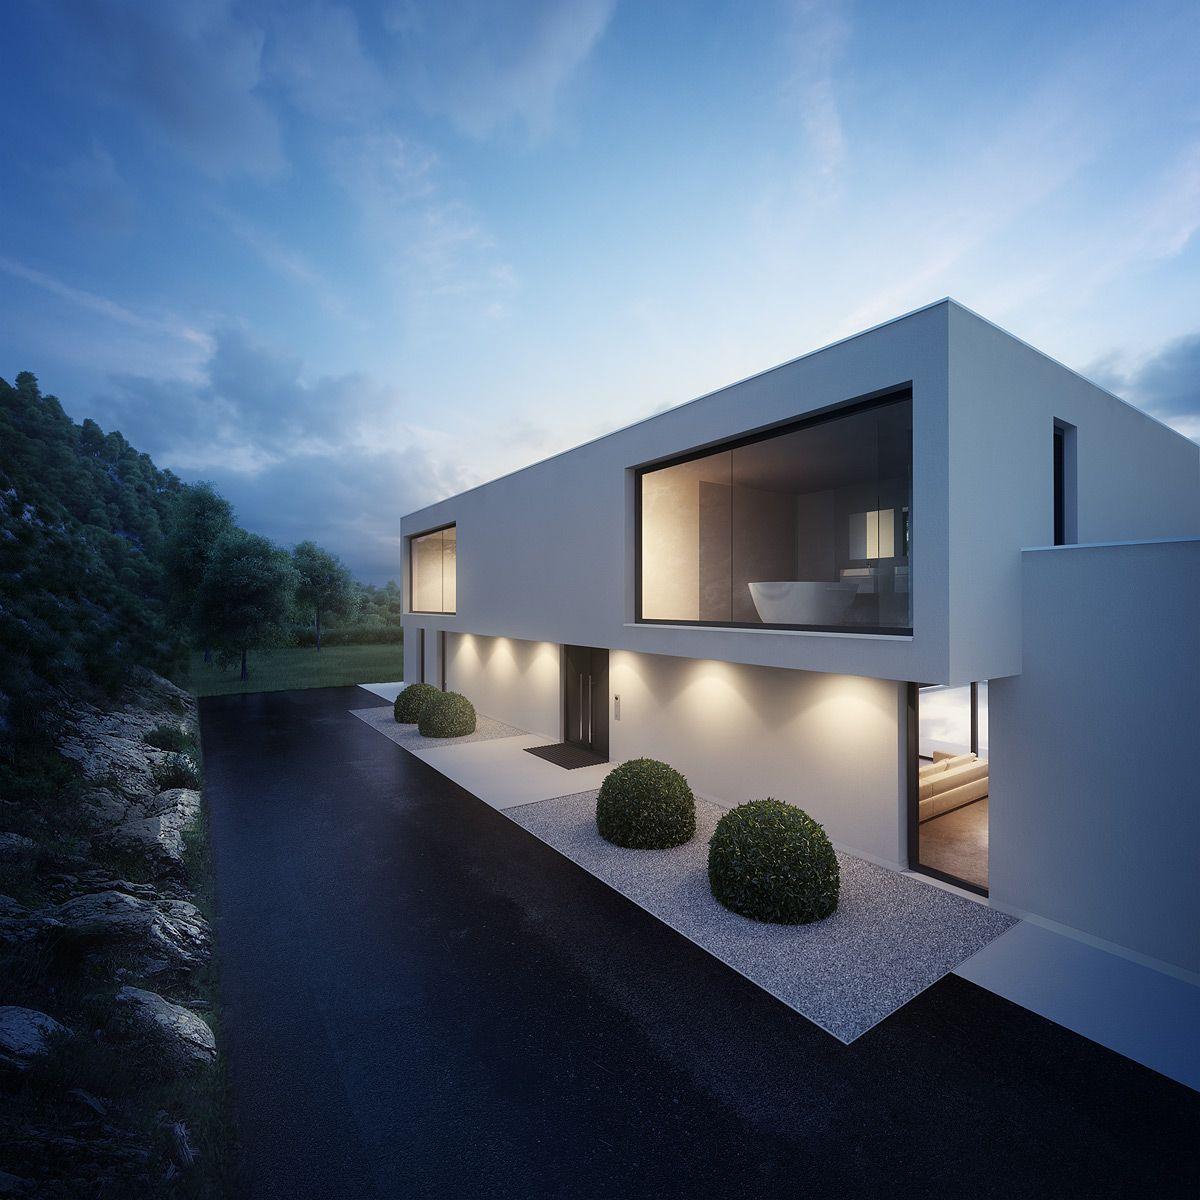 Wolf Haus wolfhaus design search architecture haus